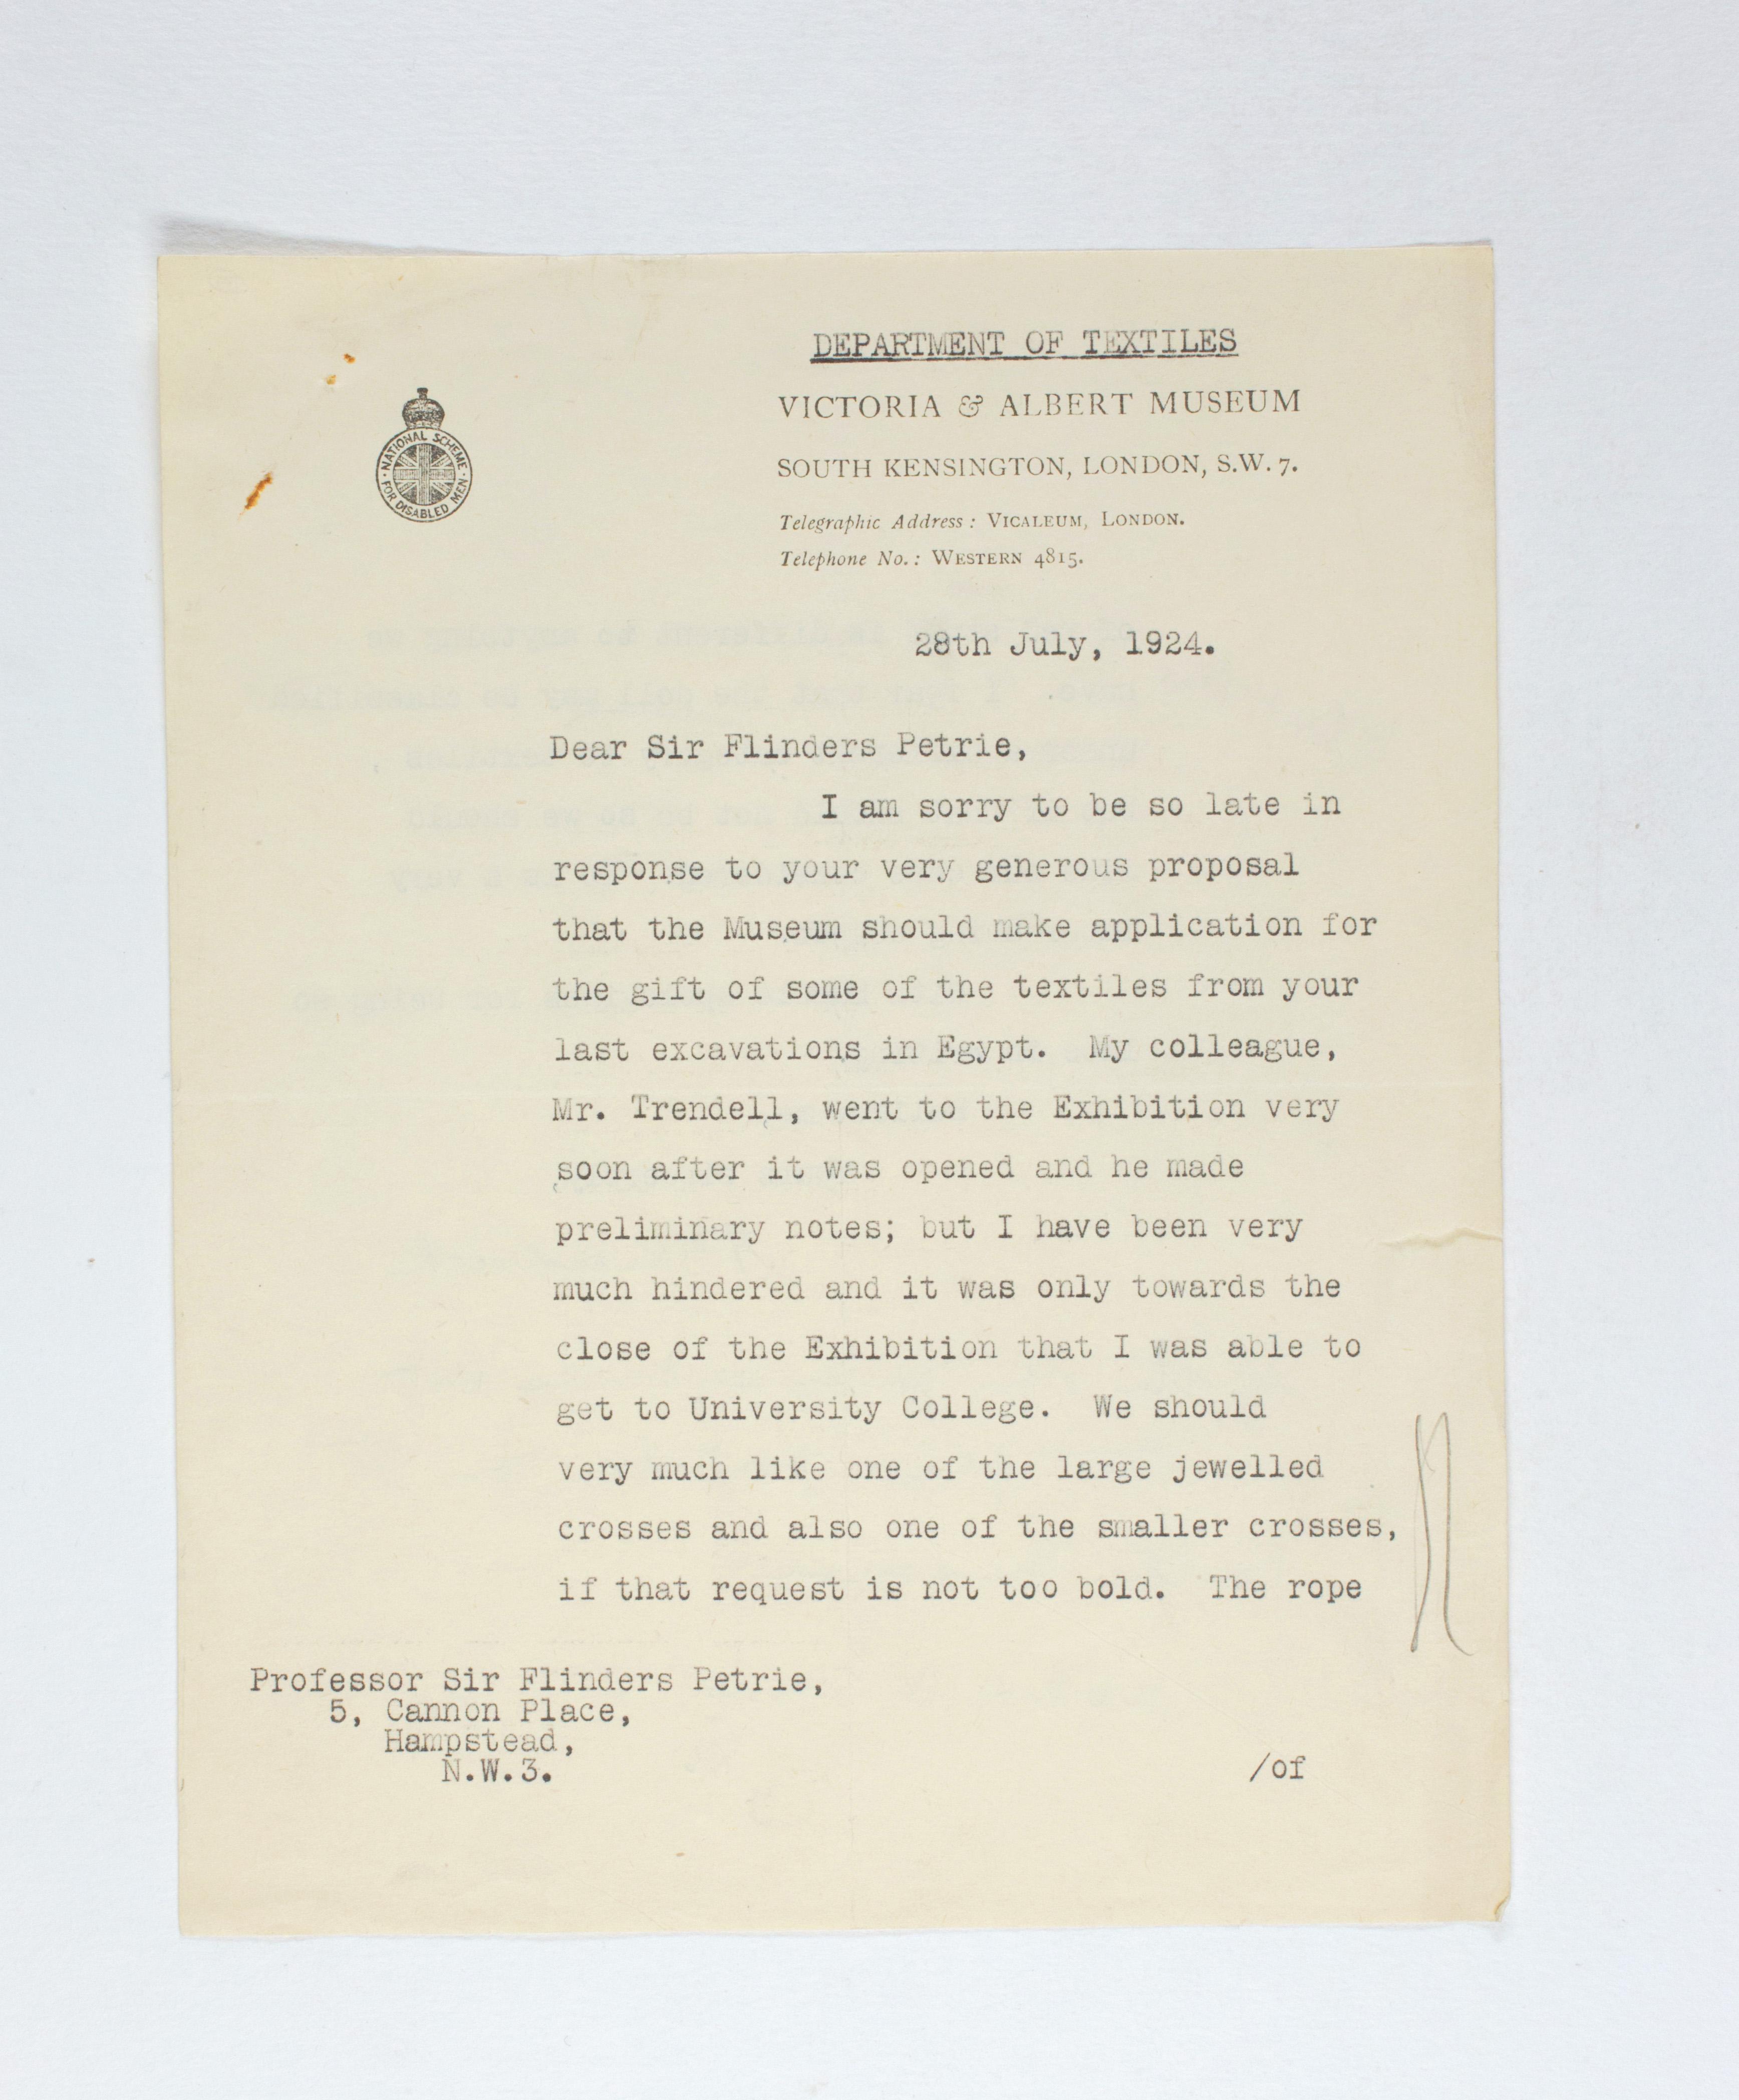 1923-24 Qau el-Kebir, Hemamieh Correspondence PMA/WFP1/D/27/39.1